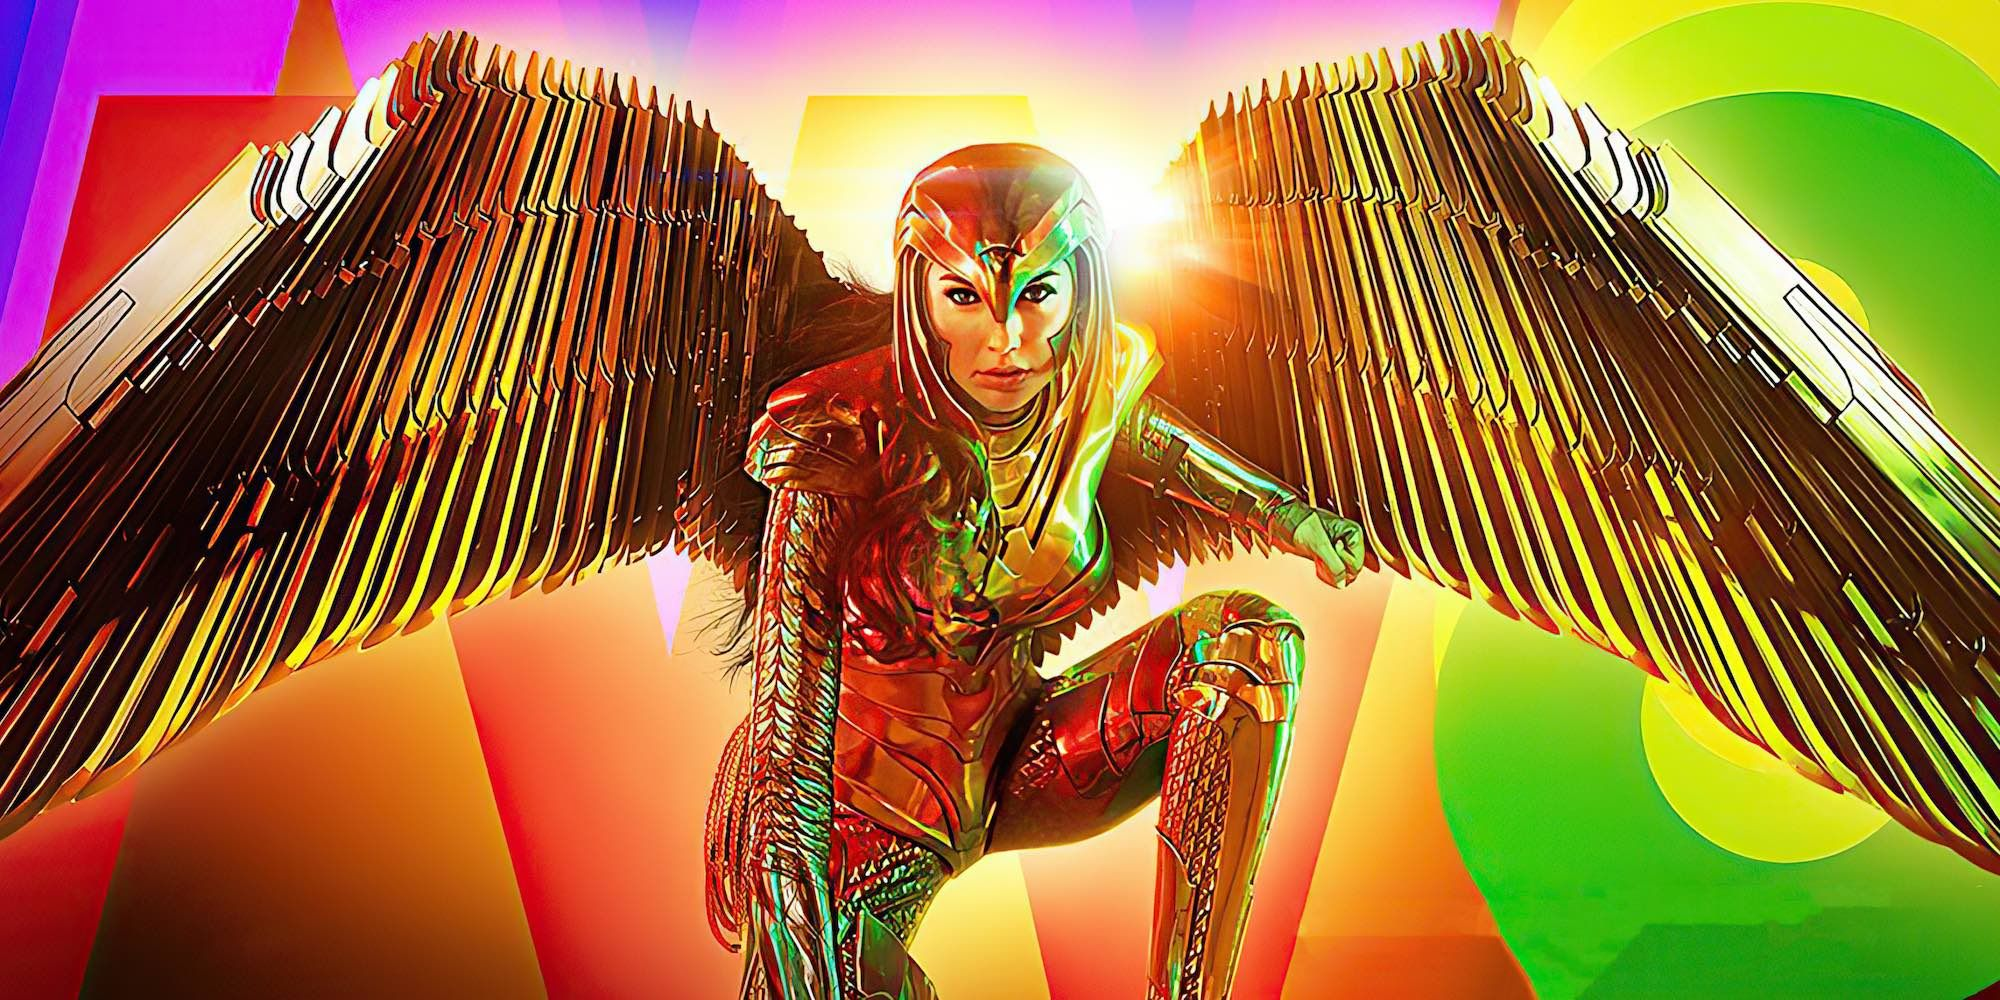 Nữ Thần Chiến Binh 1984 - Wonder Woman 1984 (2020)